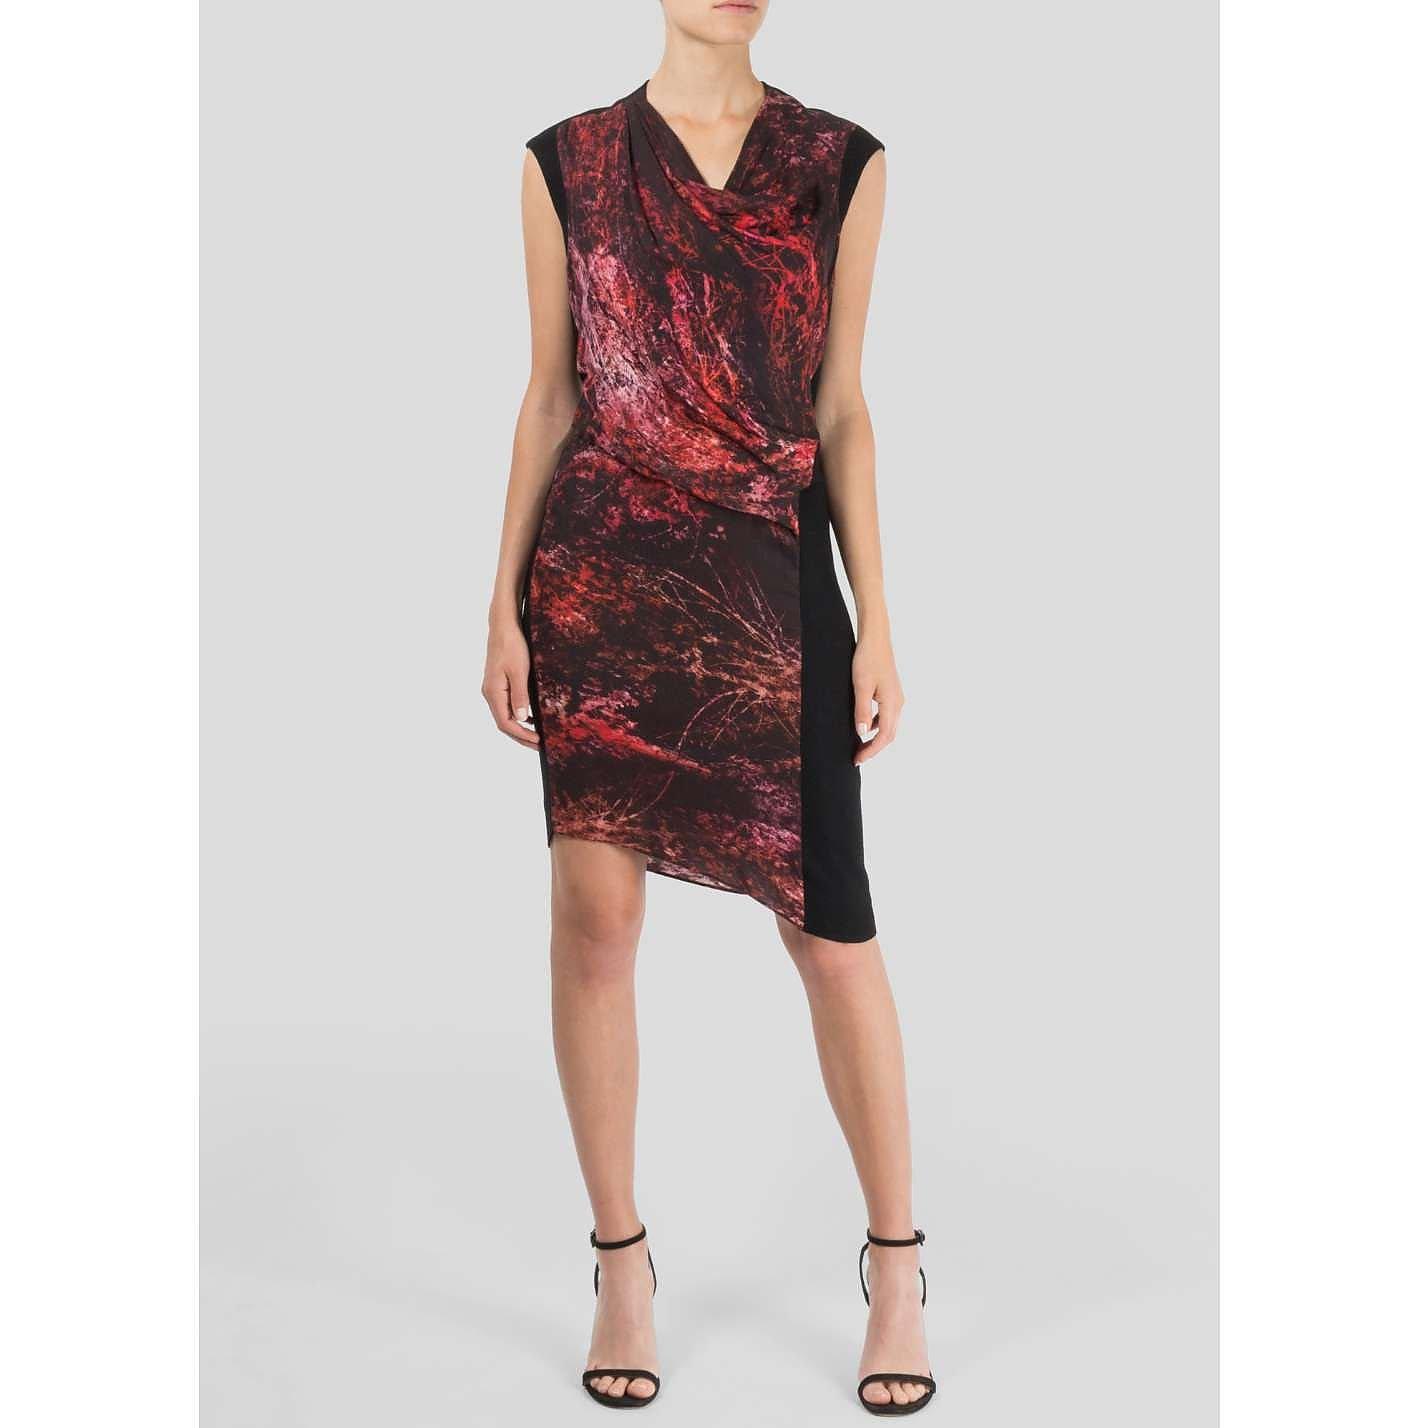 HELMUT LANG Graphic Print Dress